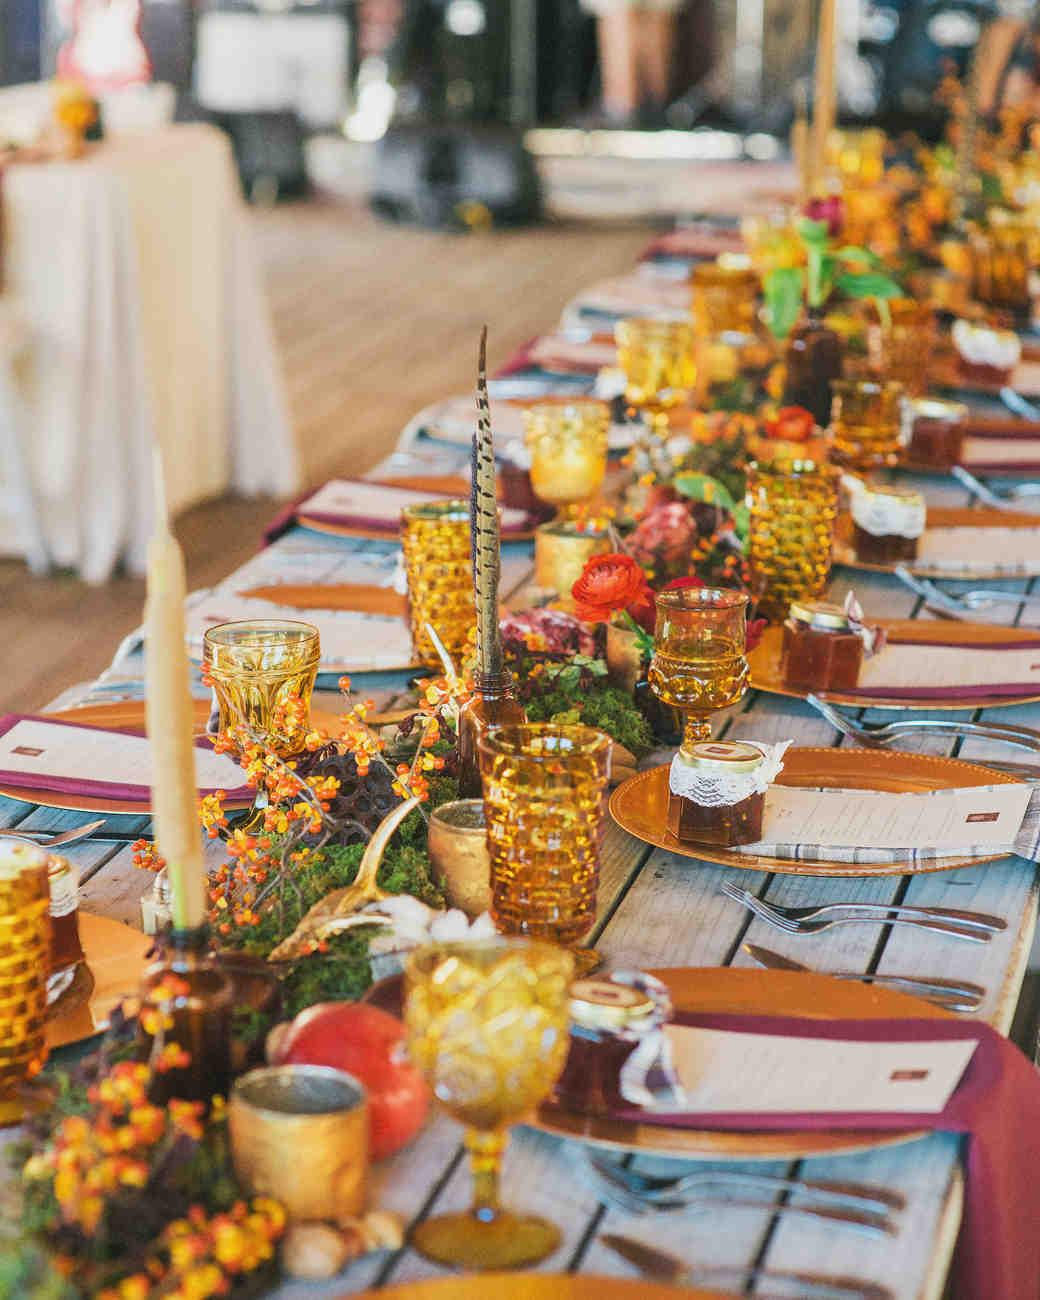 Rustic Fall Wedding Favor Ideas: 51 Rustic Fall Wedding Centerpieces